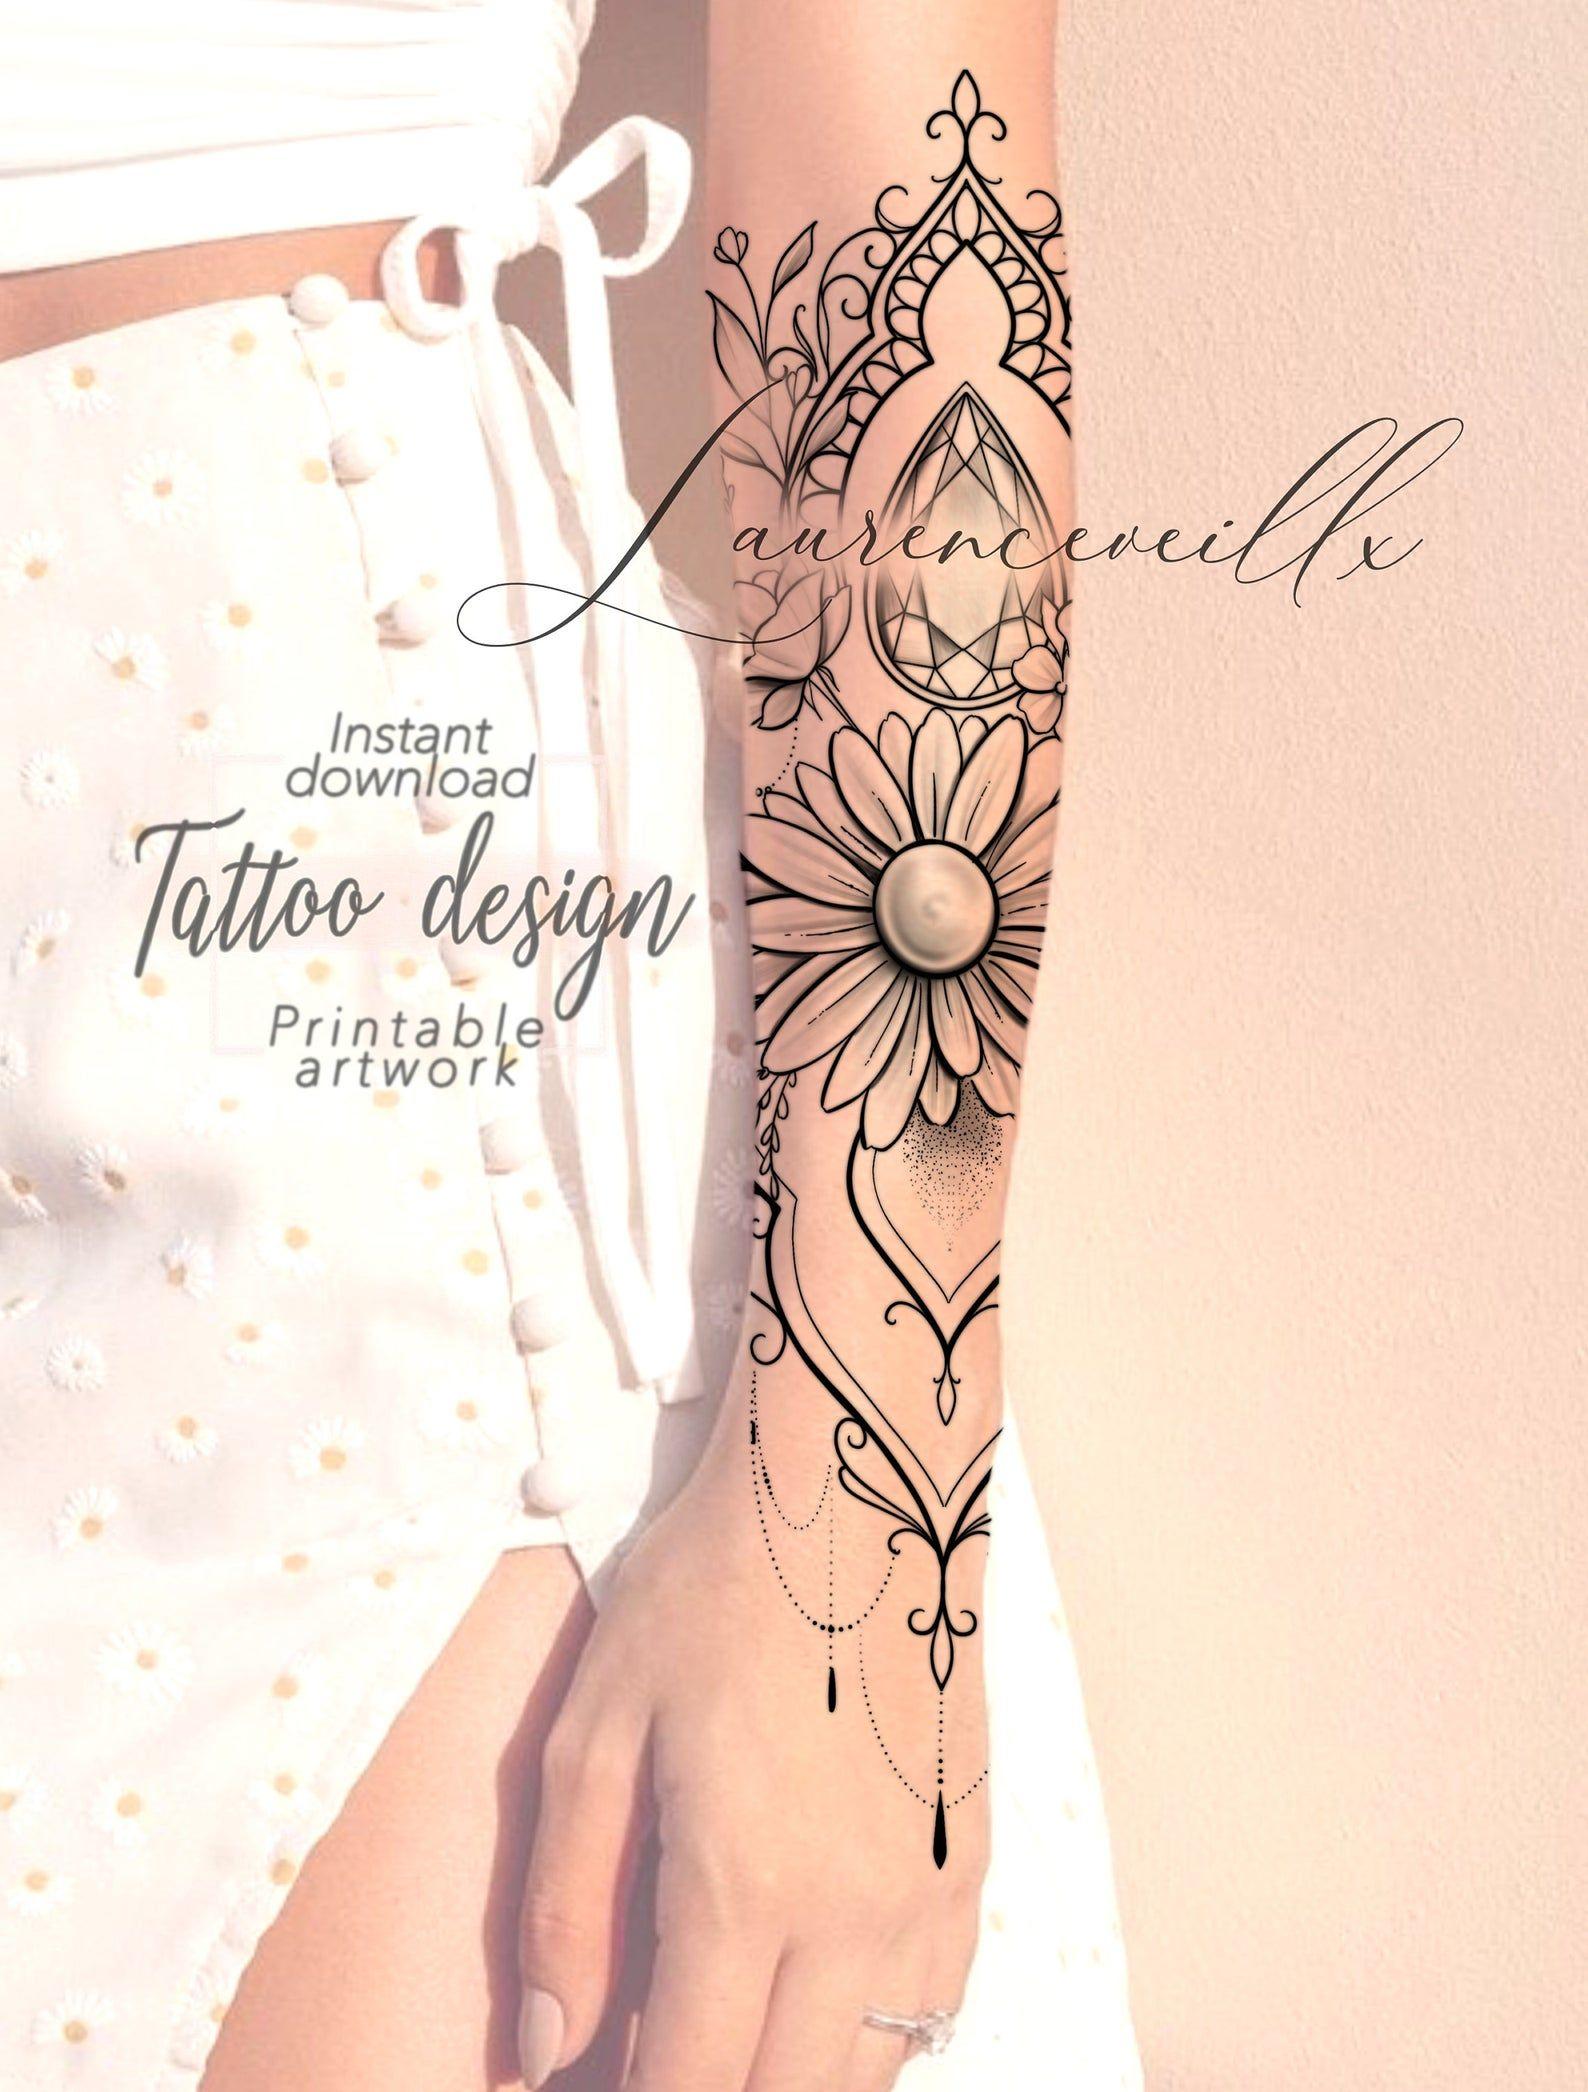 Printable Tattoo Design Instant Download Tattoo Design Etsy In 2020 Printable Tattoos Tattoos Tattoo Designs